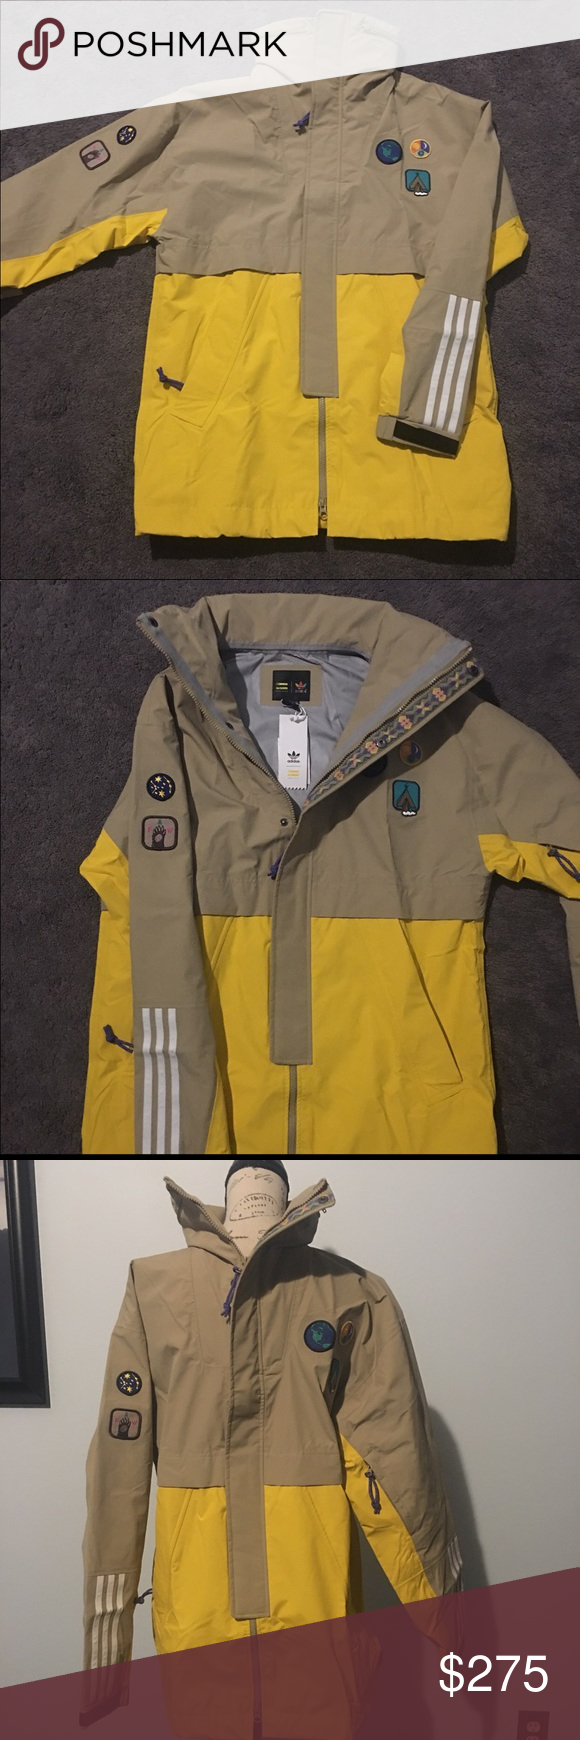 68f66e0877a2 Adidas Pharrell Williams Hu Hiking 3 layer Jacket Adidas x Pharrell  Williams Men Hu Hiking 3